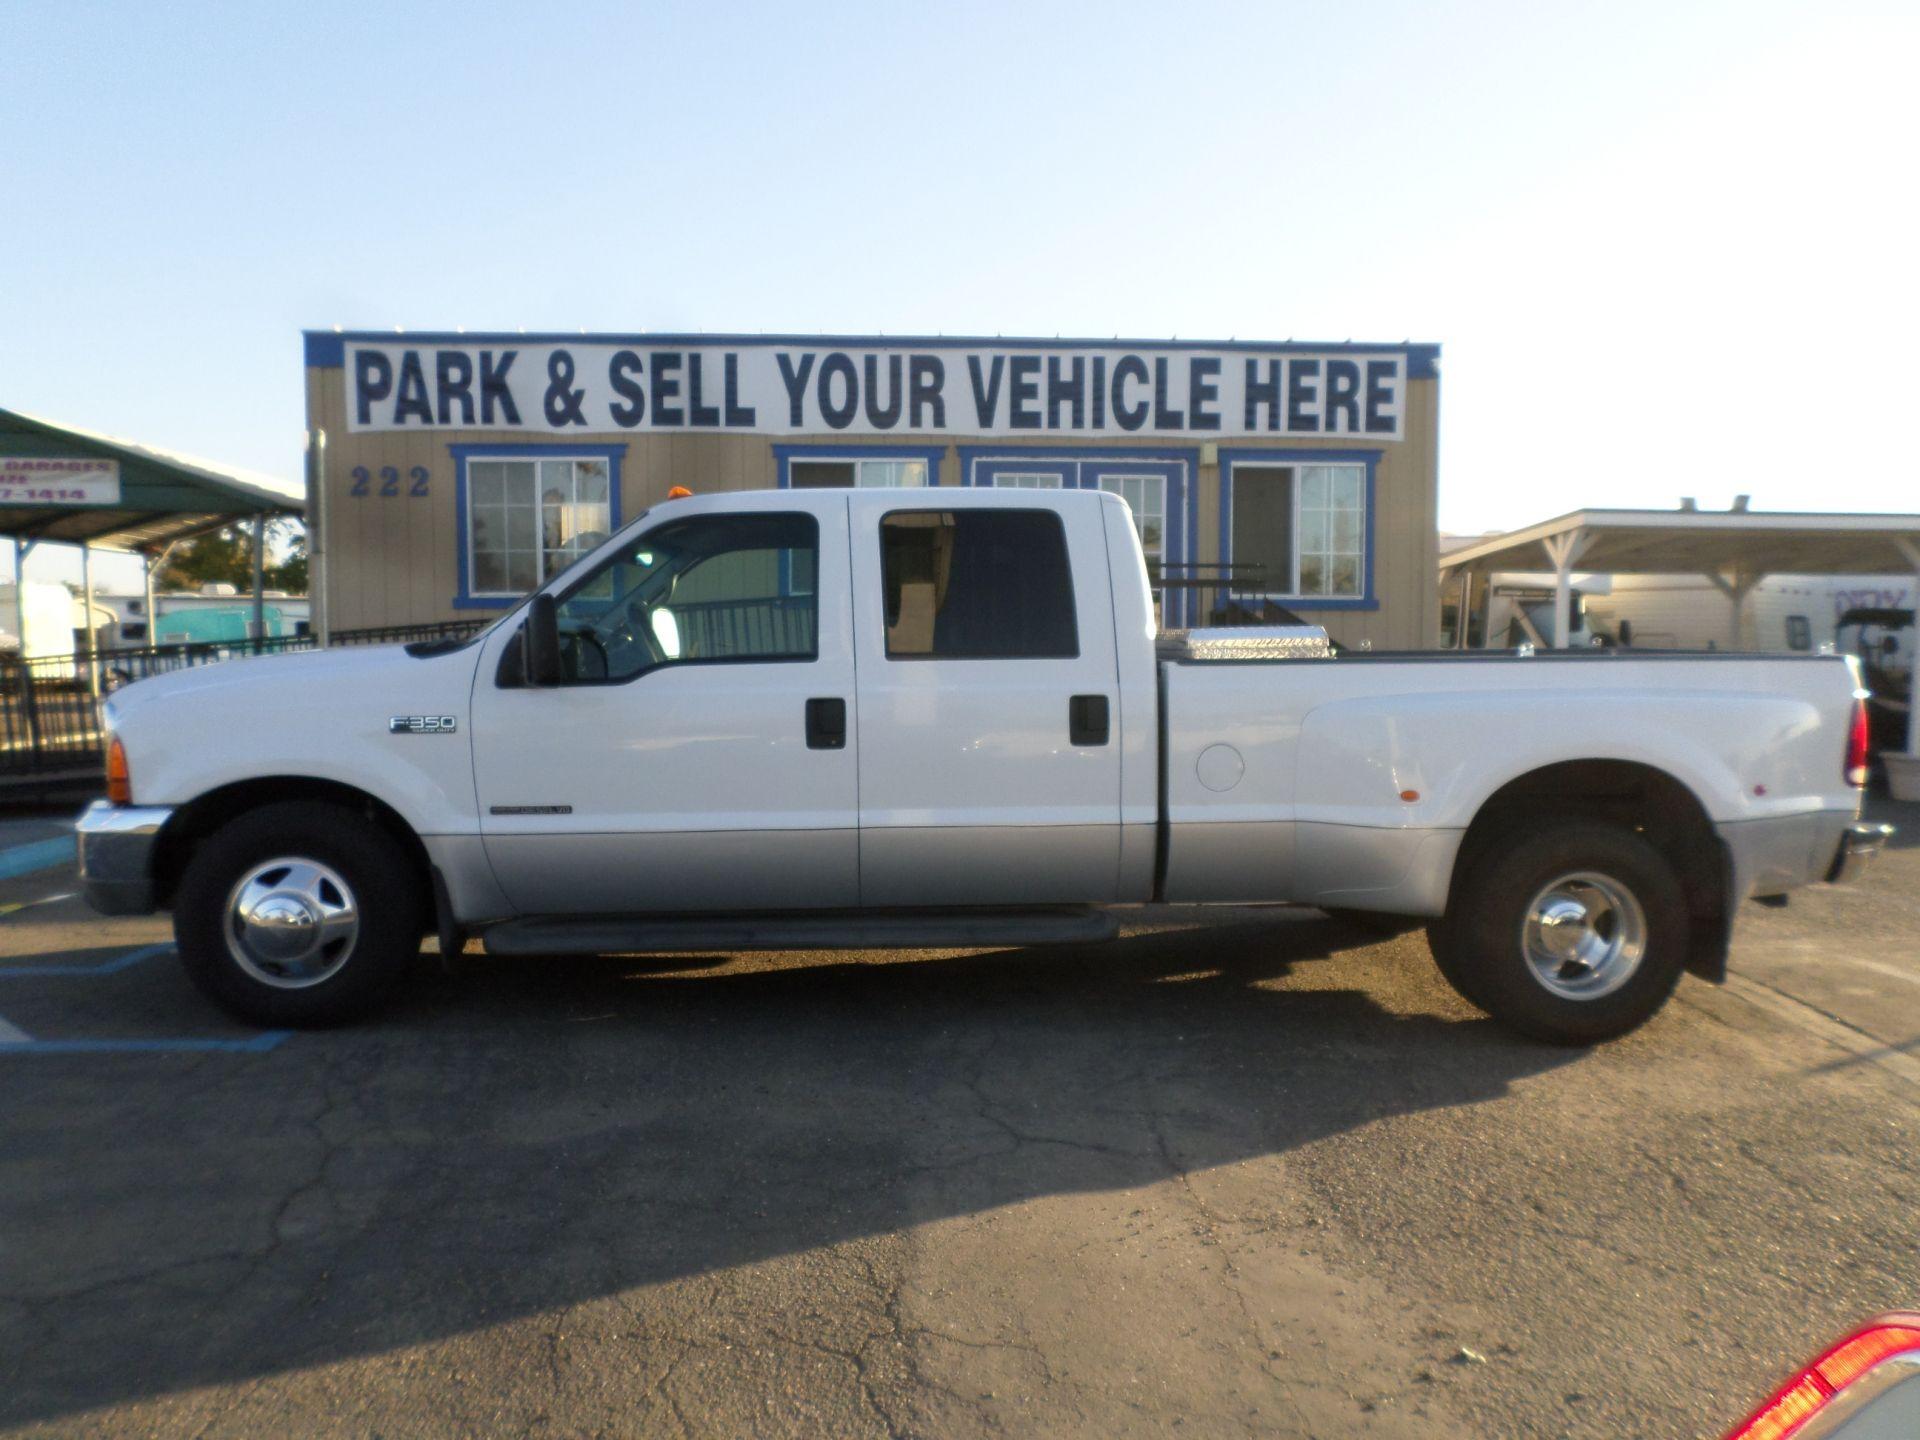 Truck For Sale 2000 Ford F350 Diesel Dually In Lodi Stockton Ca